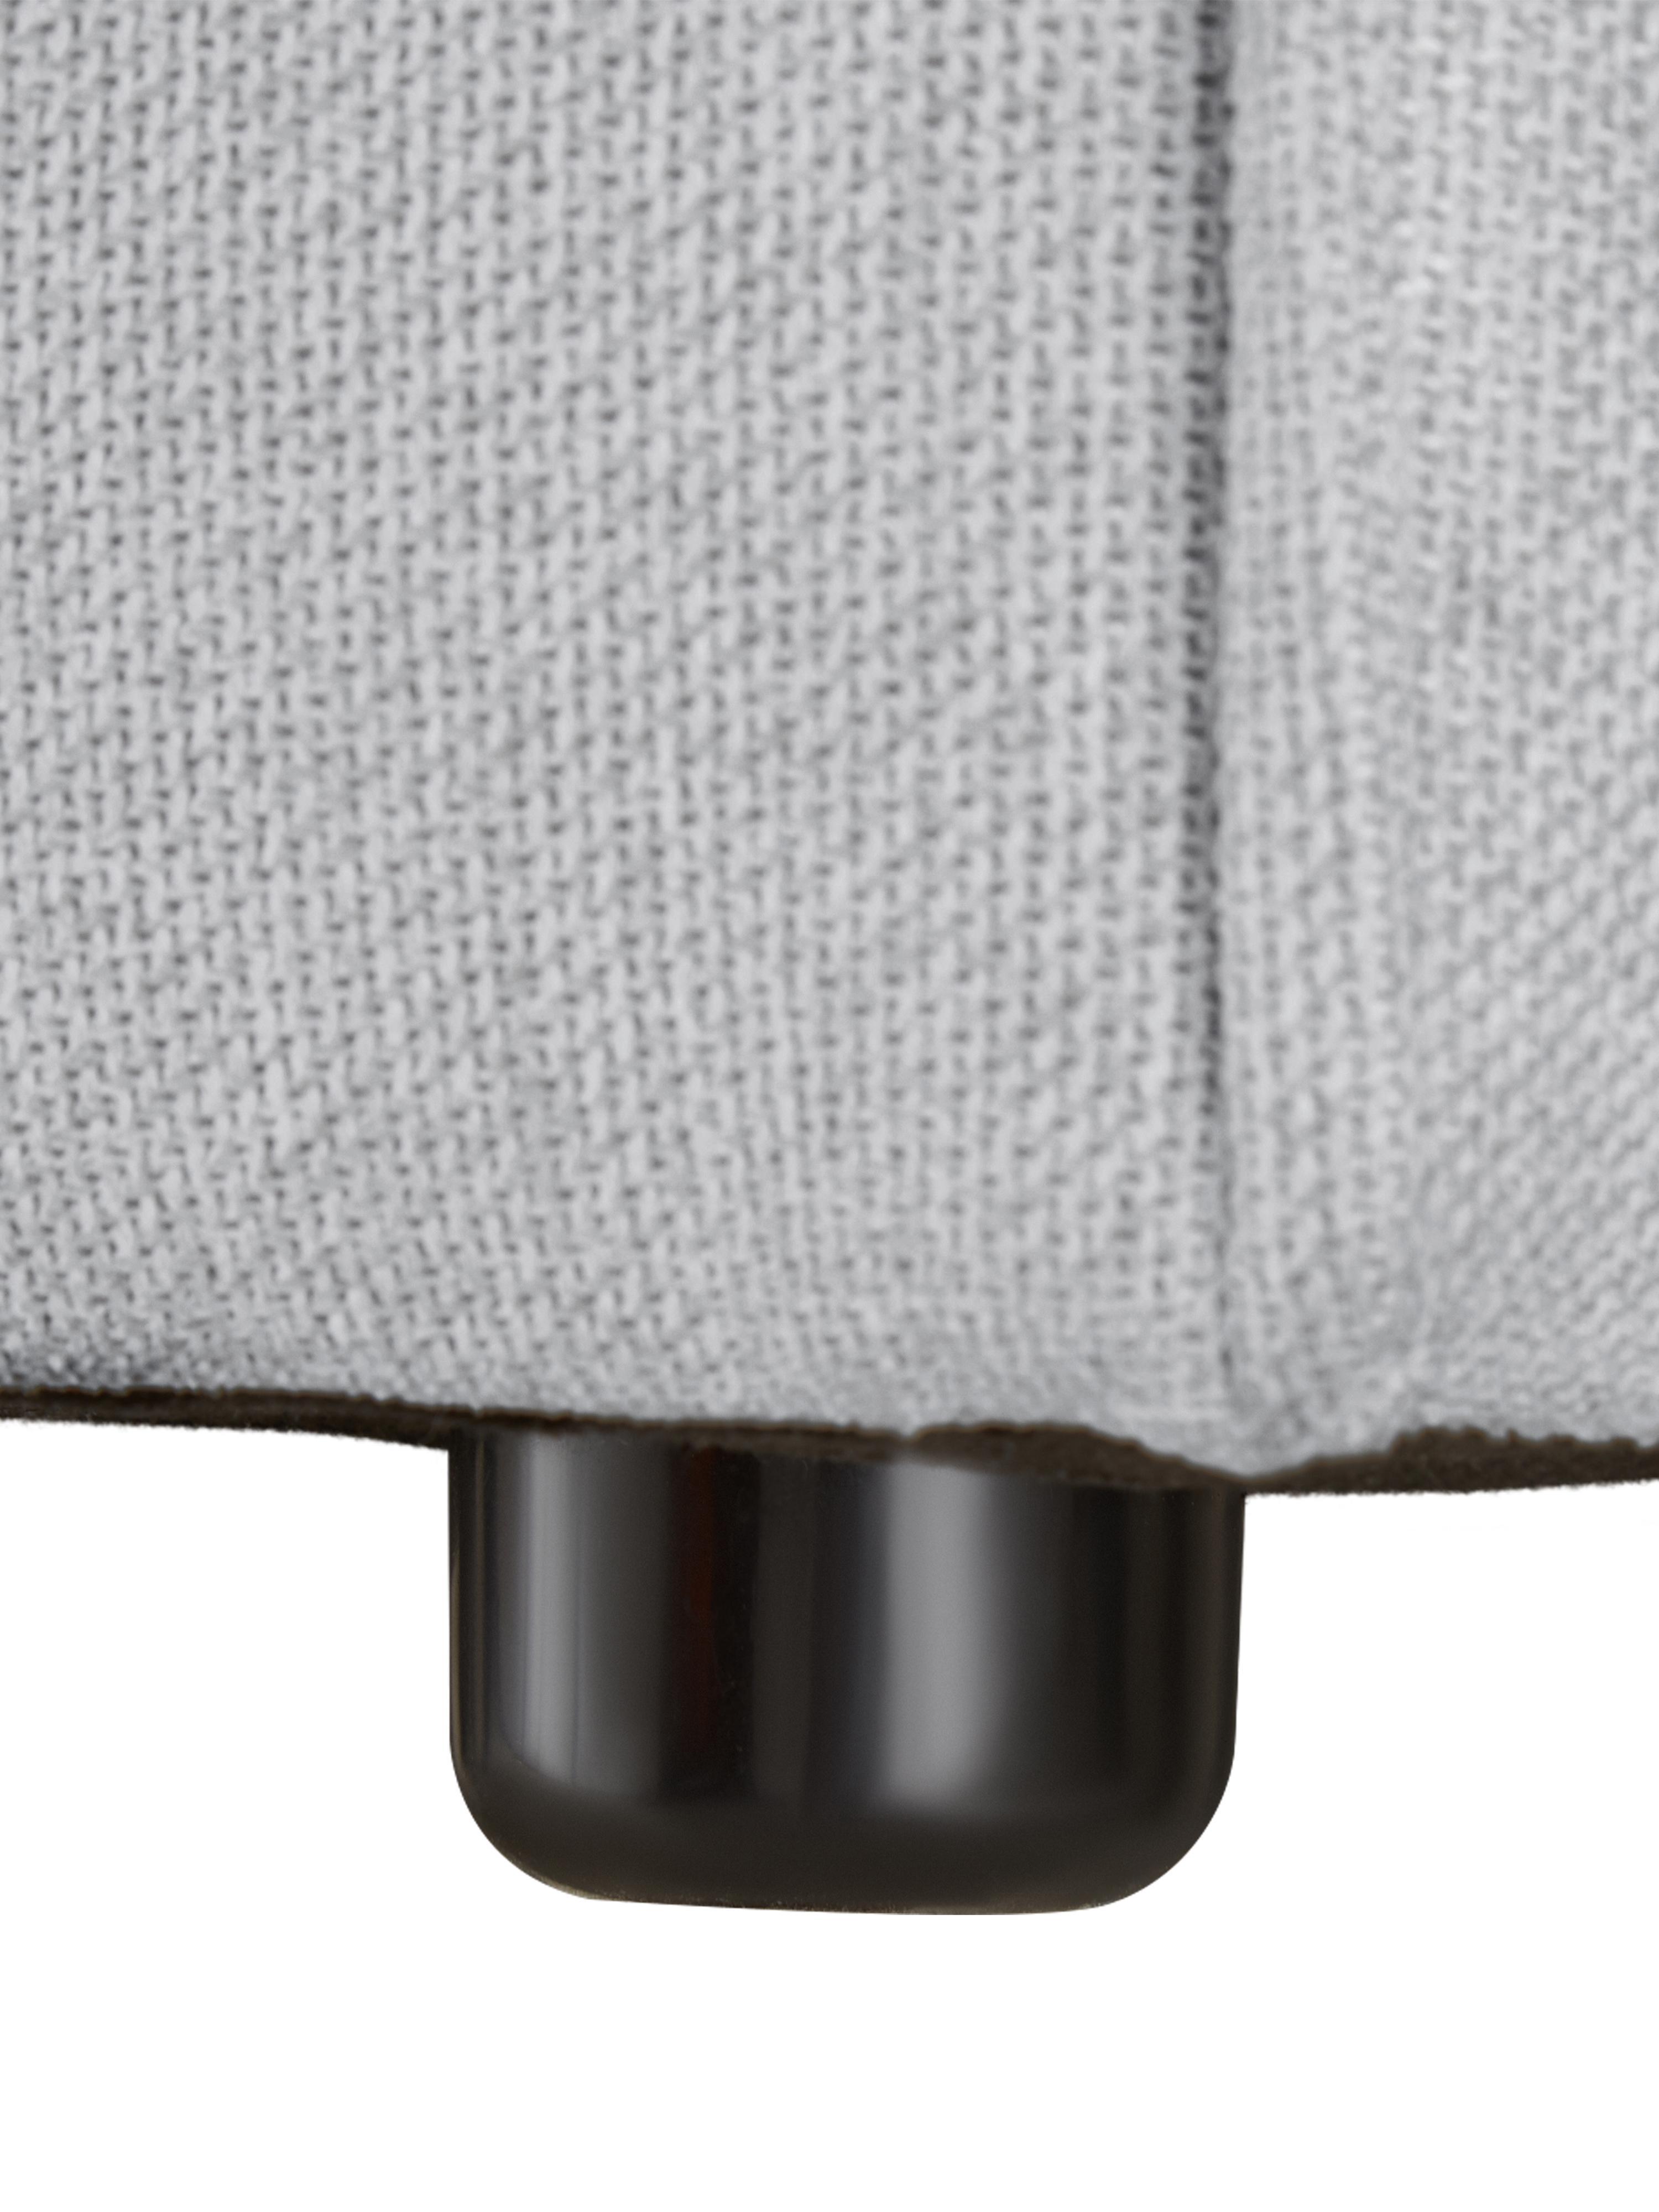 Modulare XL-Ottomane Lennon, Bezug: Polyester Der hochwertige, Gestell: Massives Kiefernholz, Spe, Füße: Kunststoff, Webstoff Hellgrau, B 357 x T 119 cm